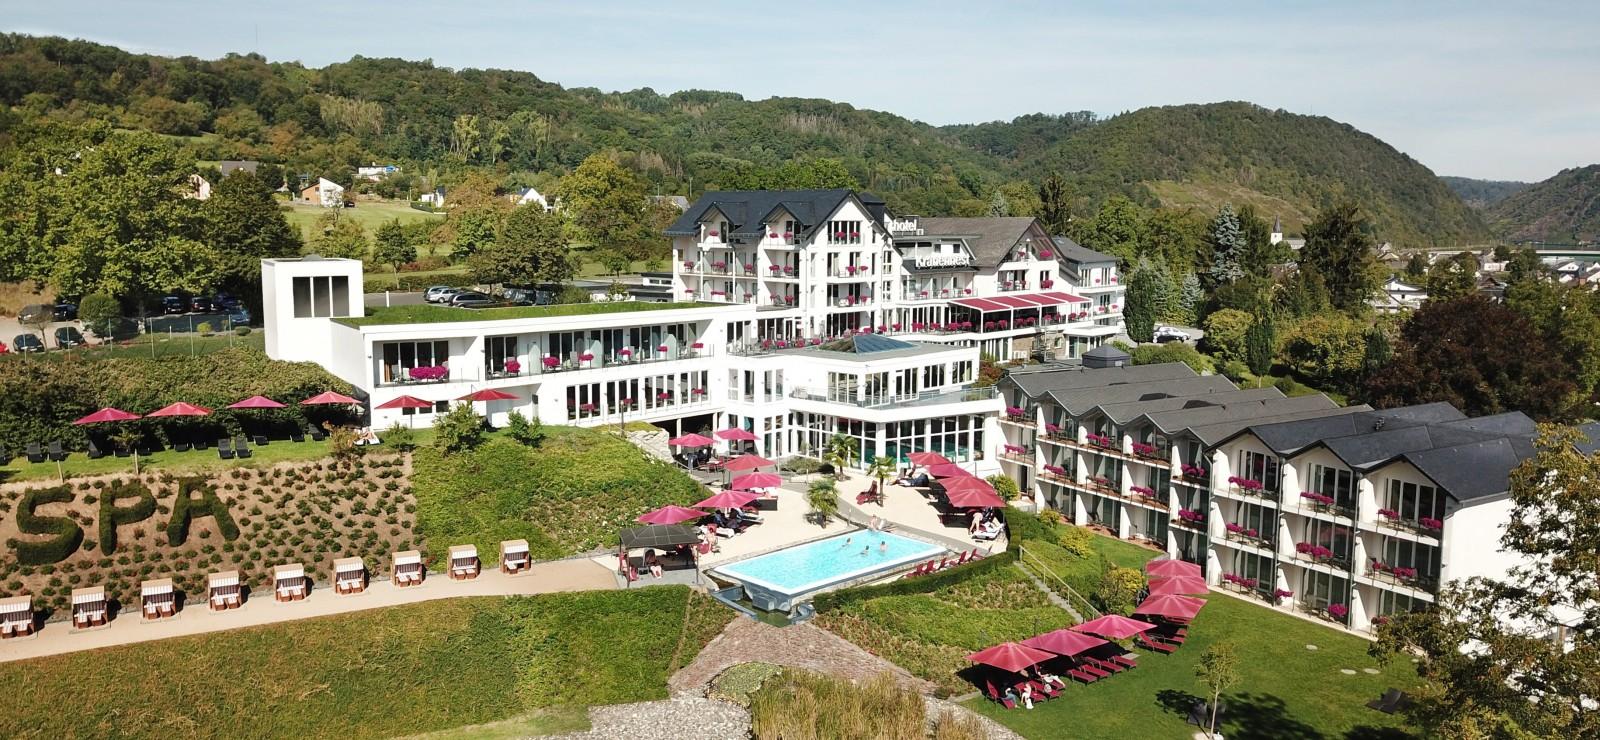 Moselstern Parkhotel Krähennest Bilder | Bild 1